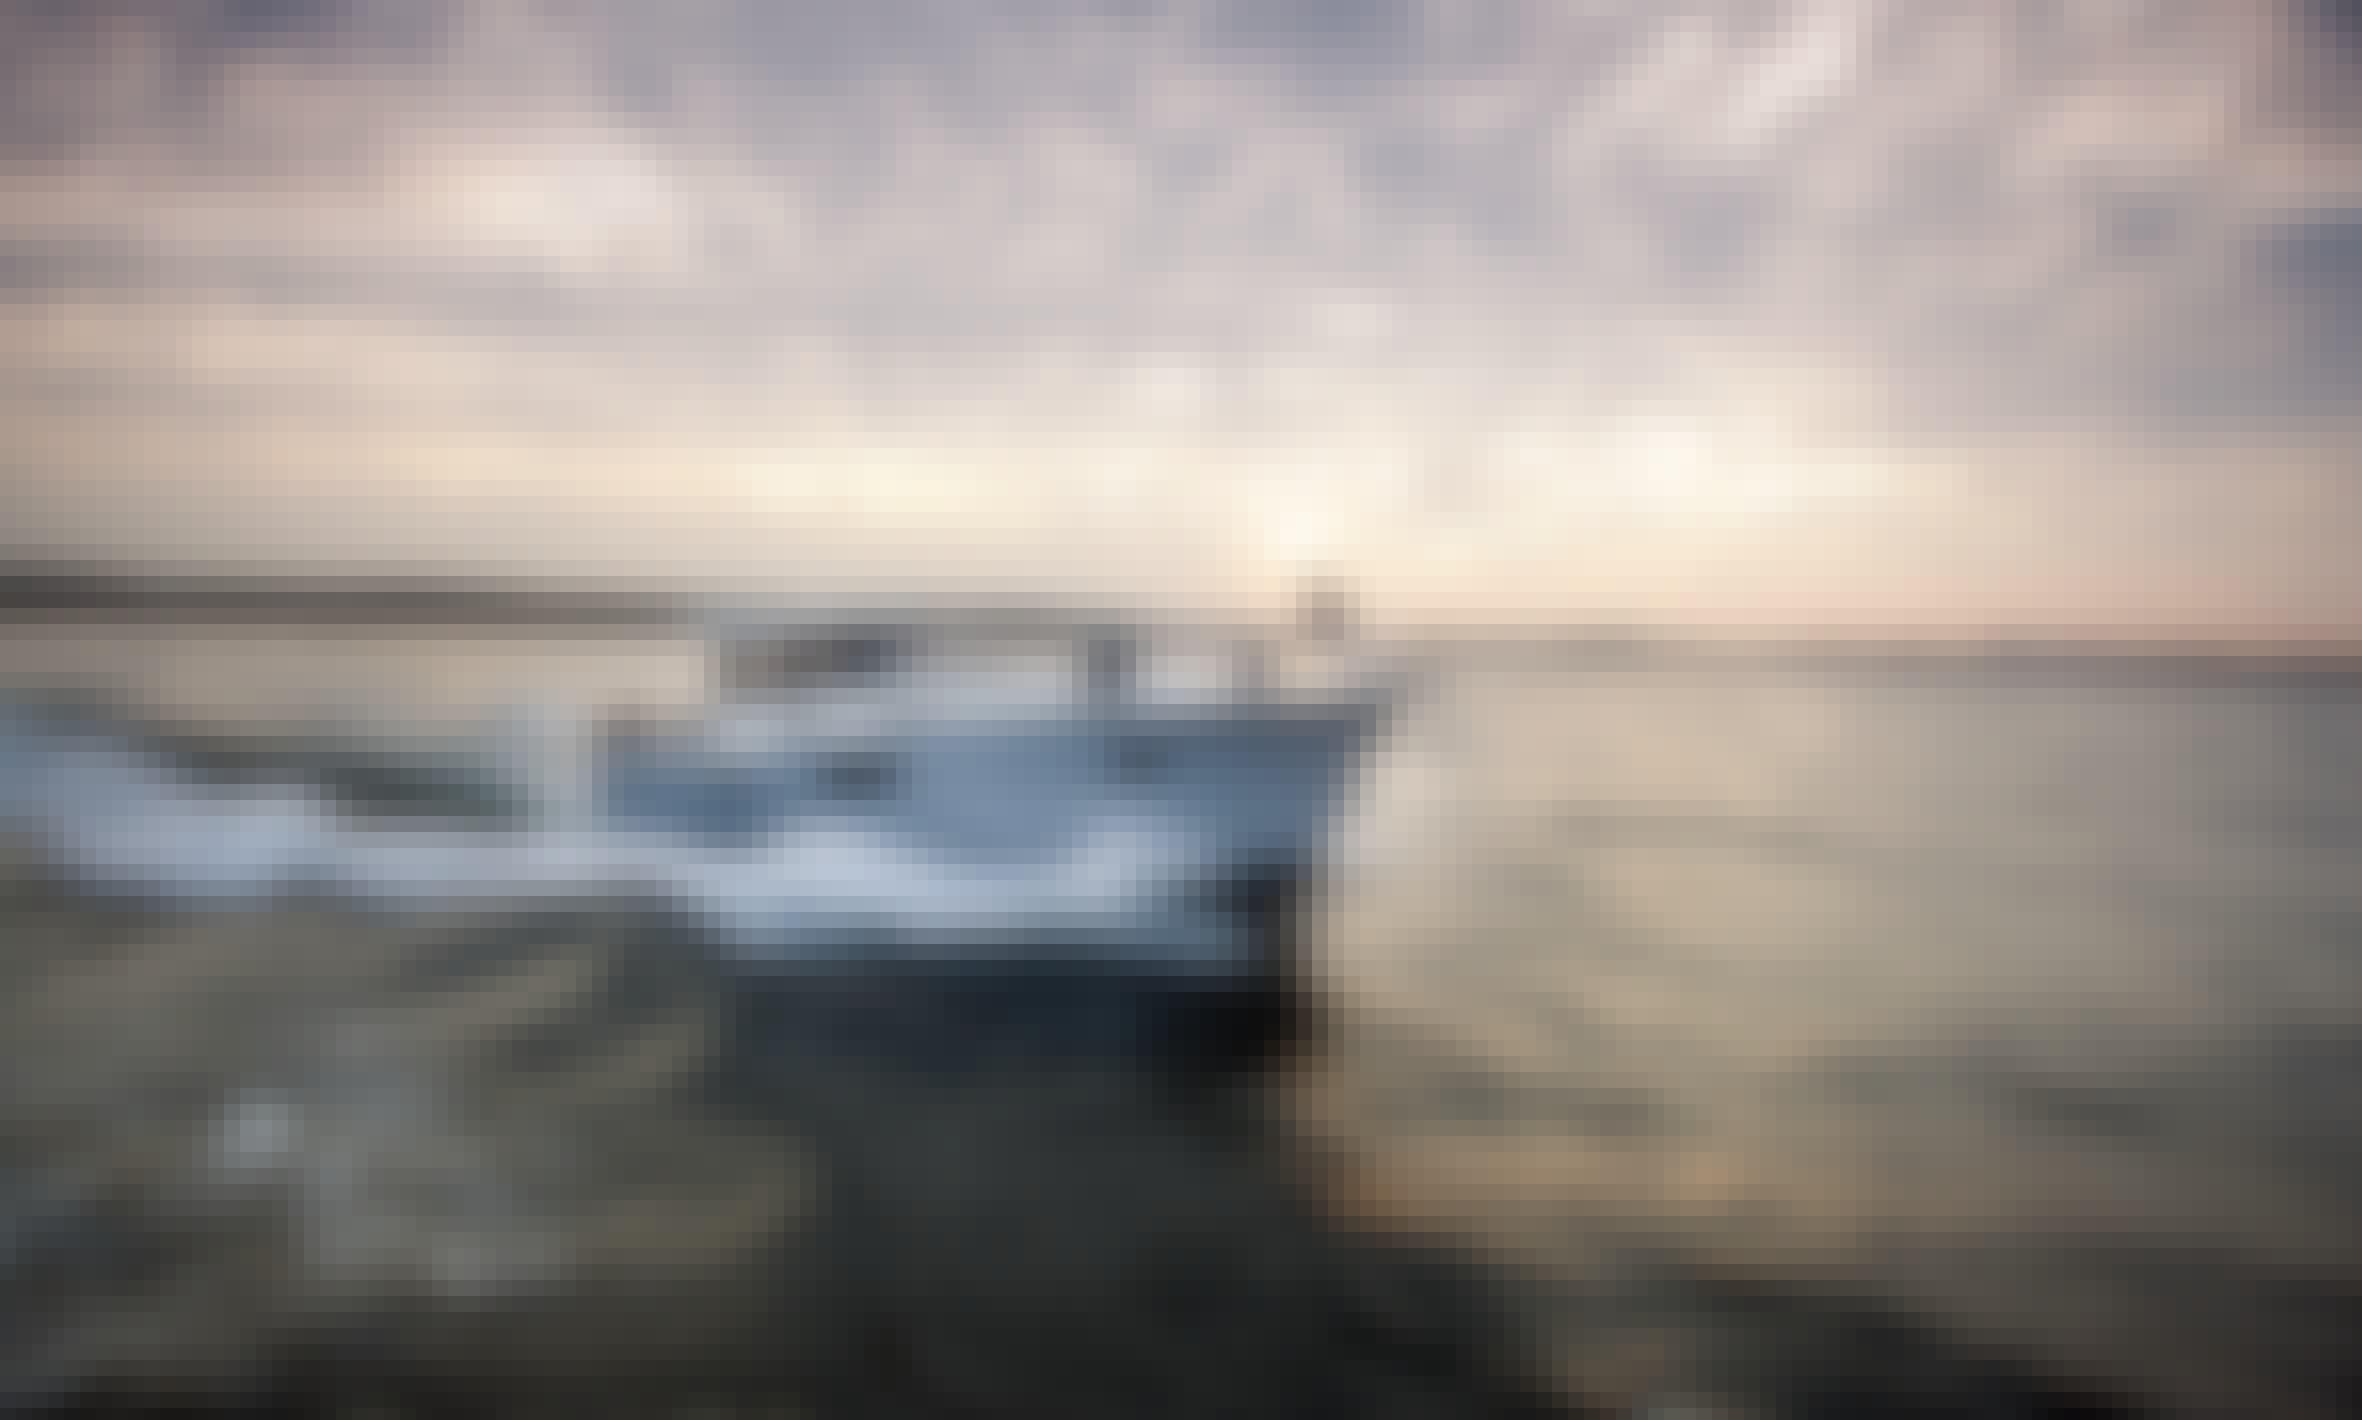 Delphia 1080S Motor Yacht in Pareklisia, Limassol - Ideal for Fishing, Leisure Trips and Custom Cruises!